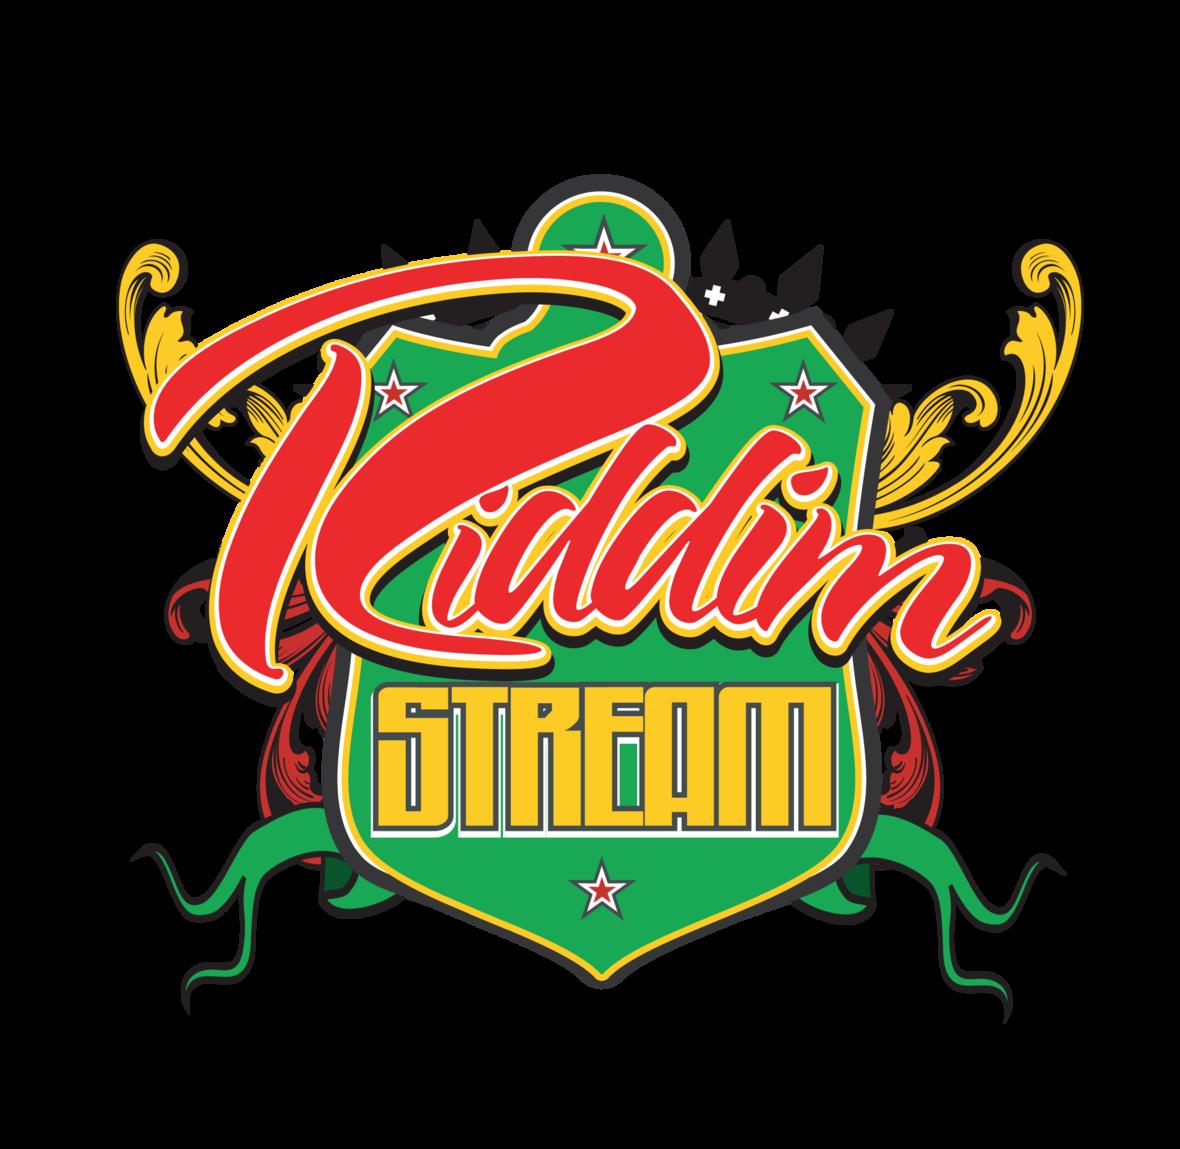 Riddimstream logo